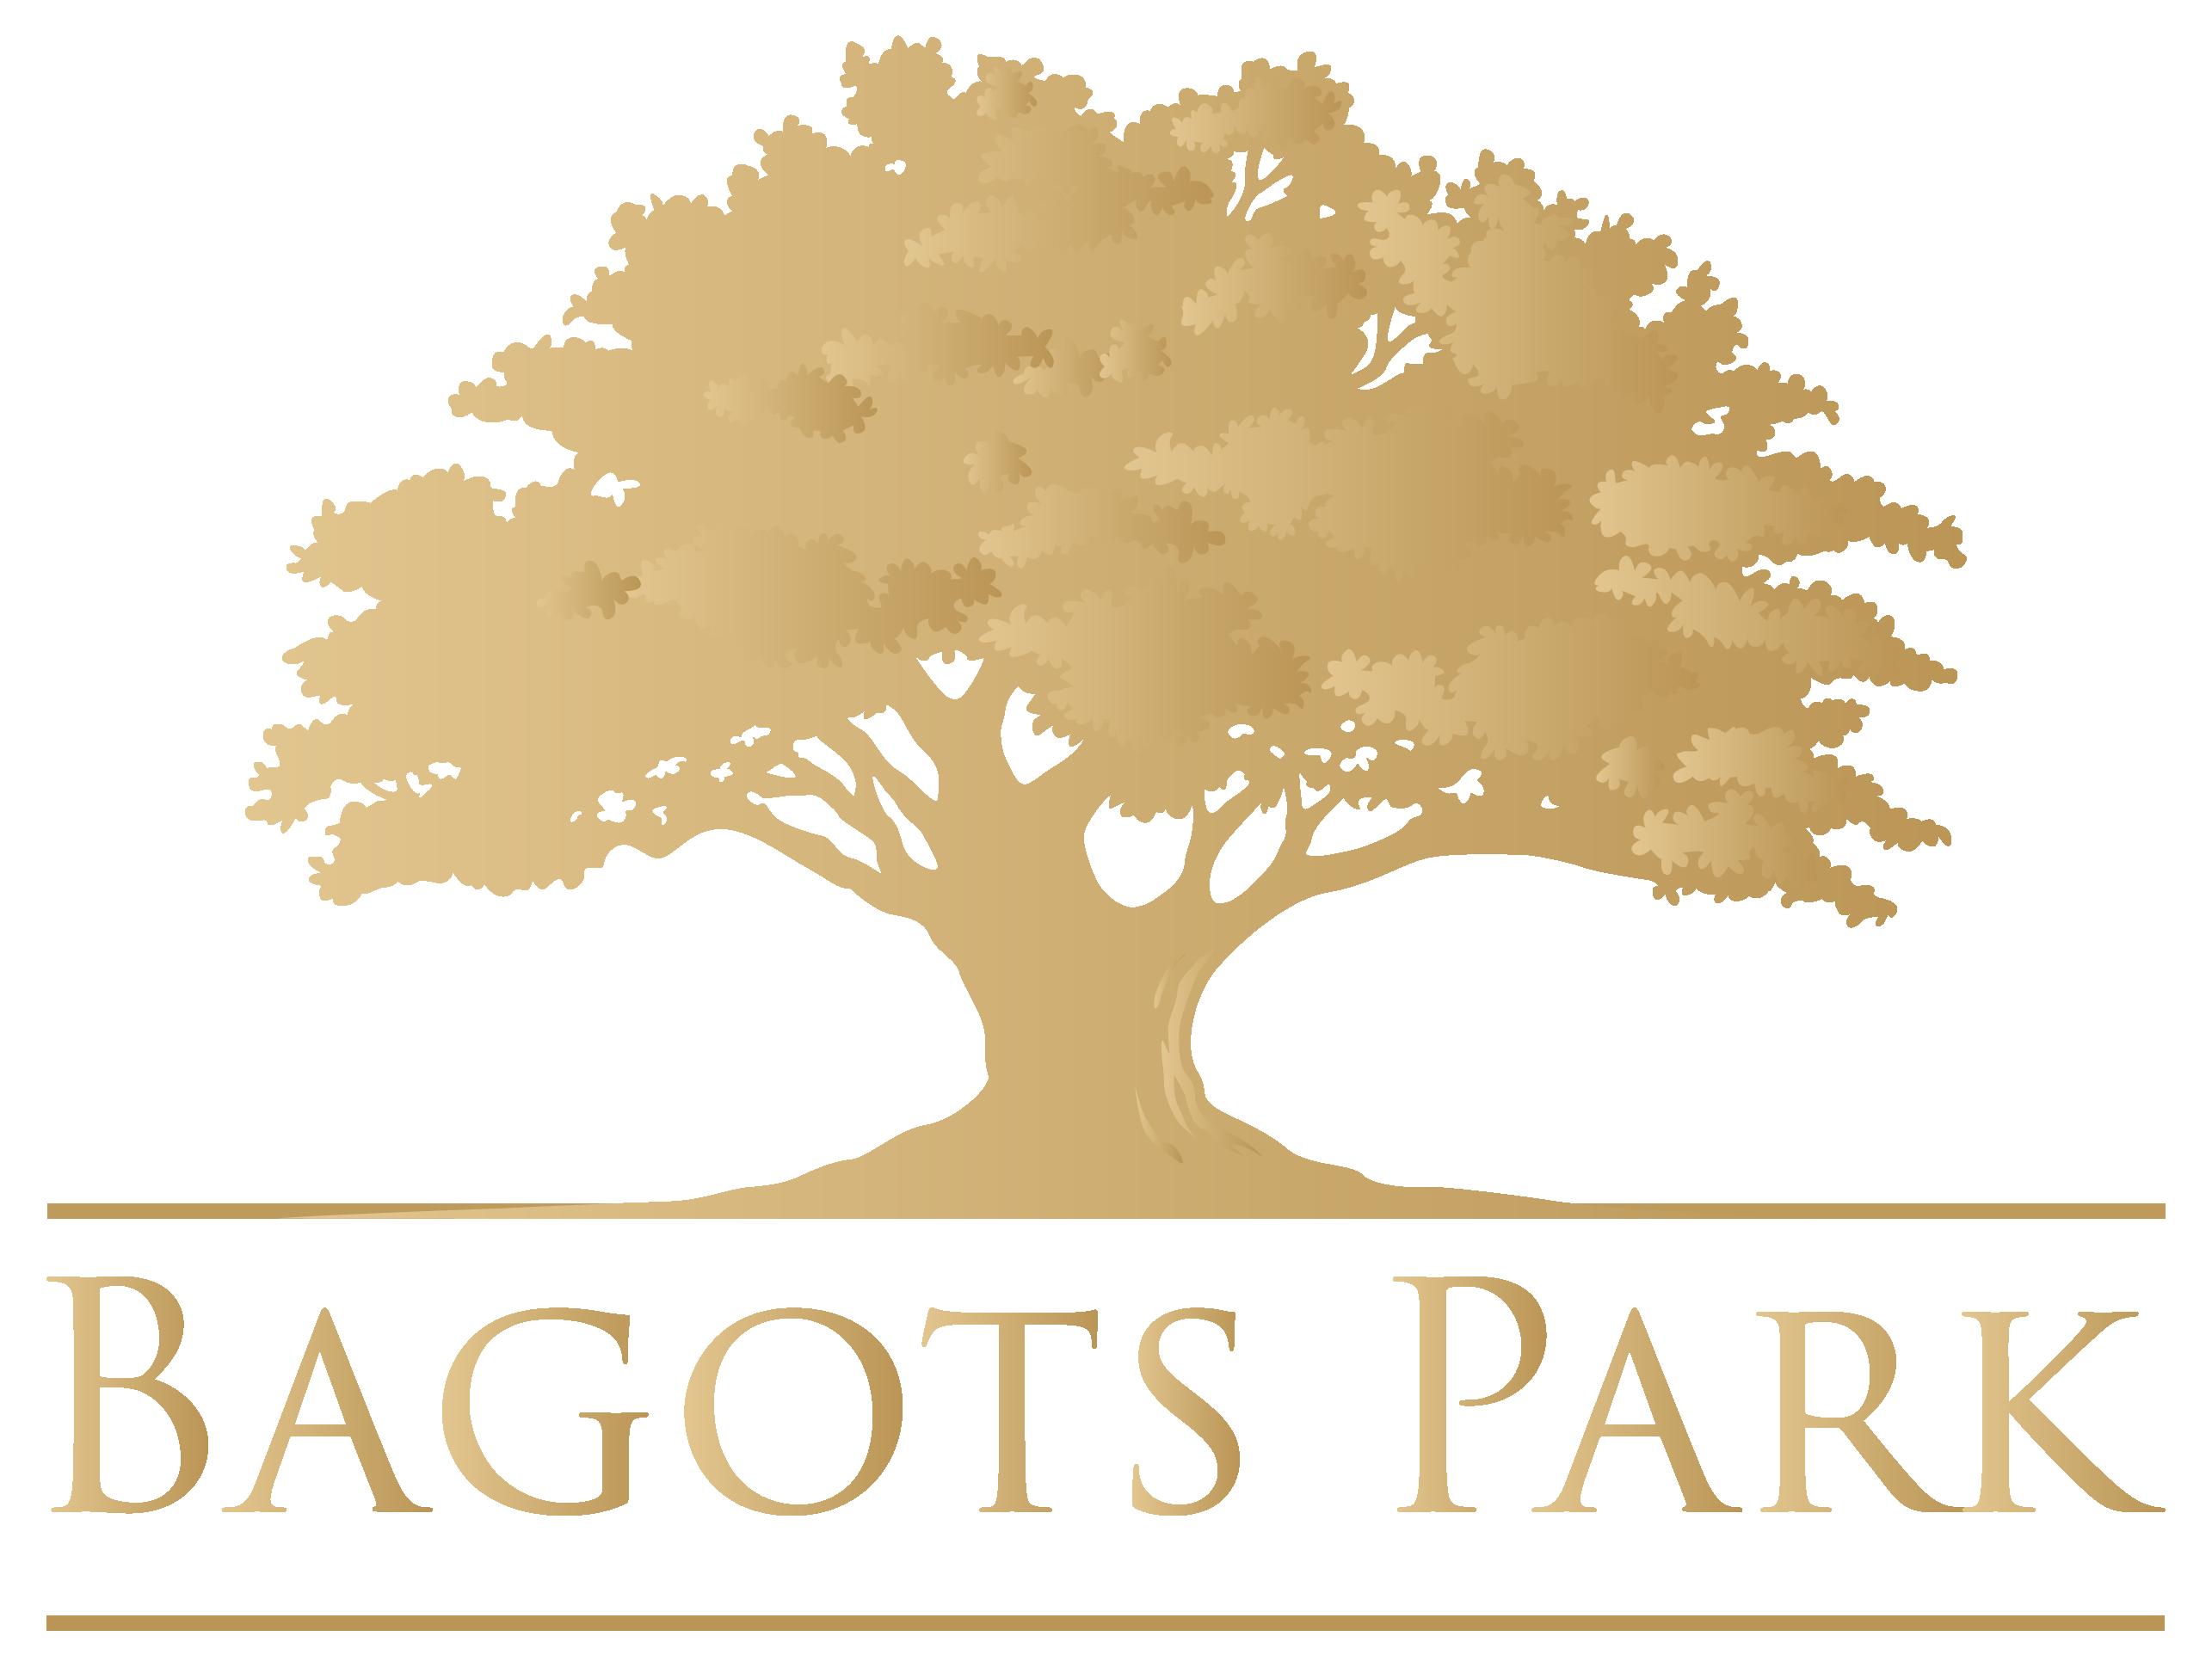 Bagots Park